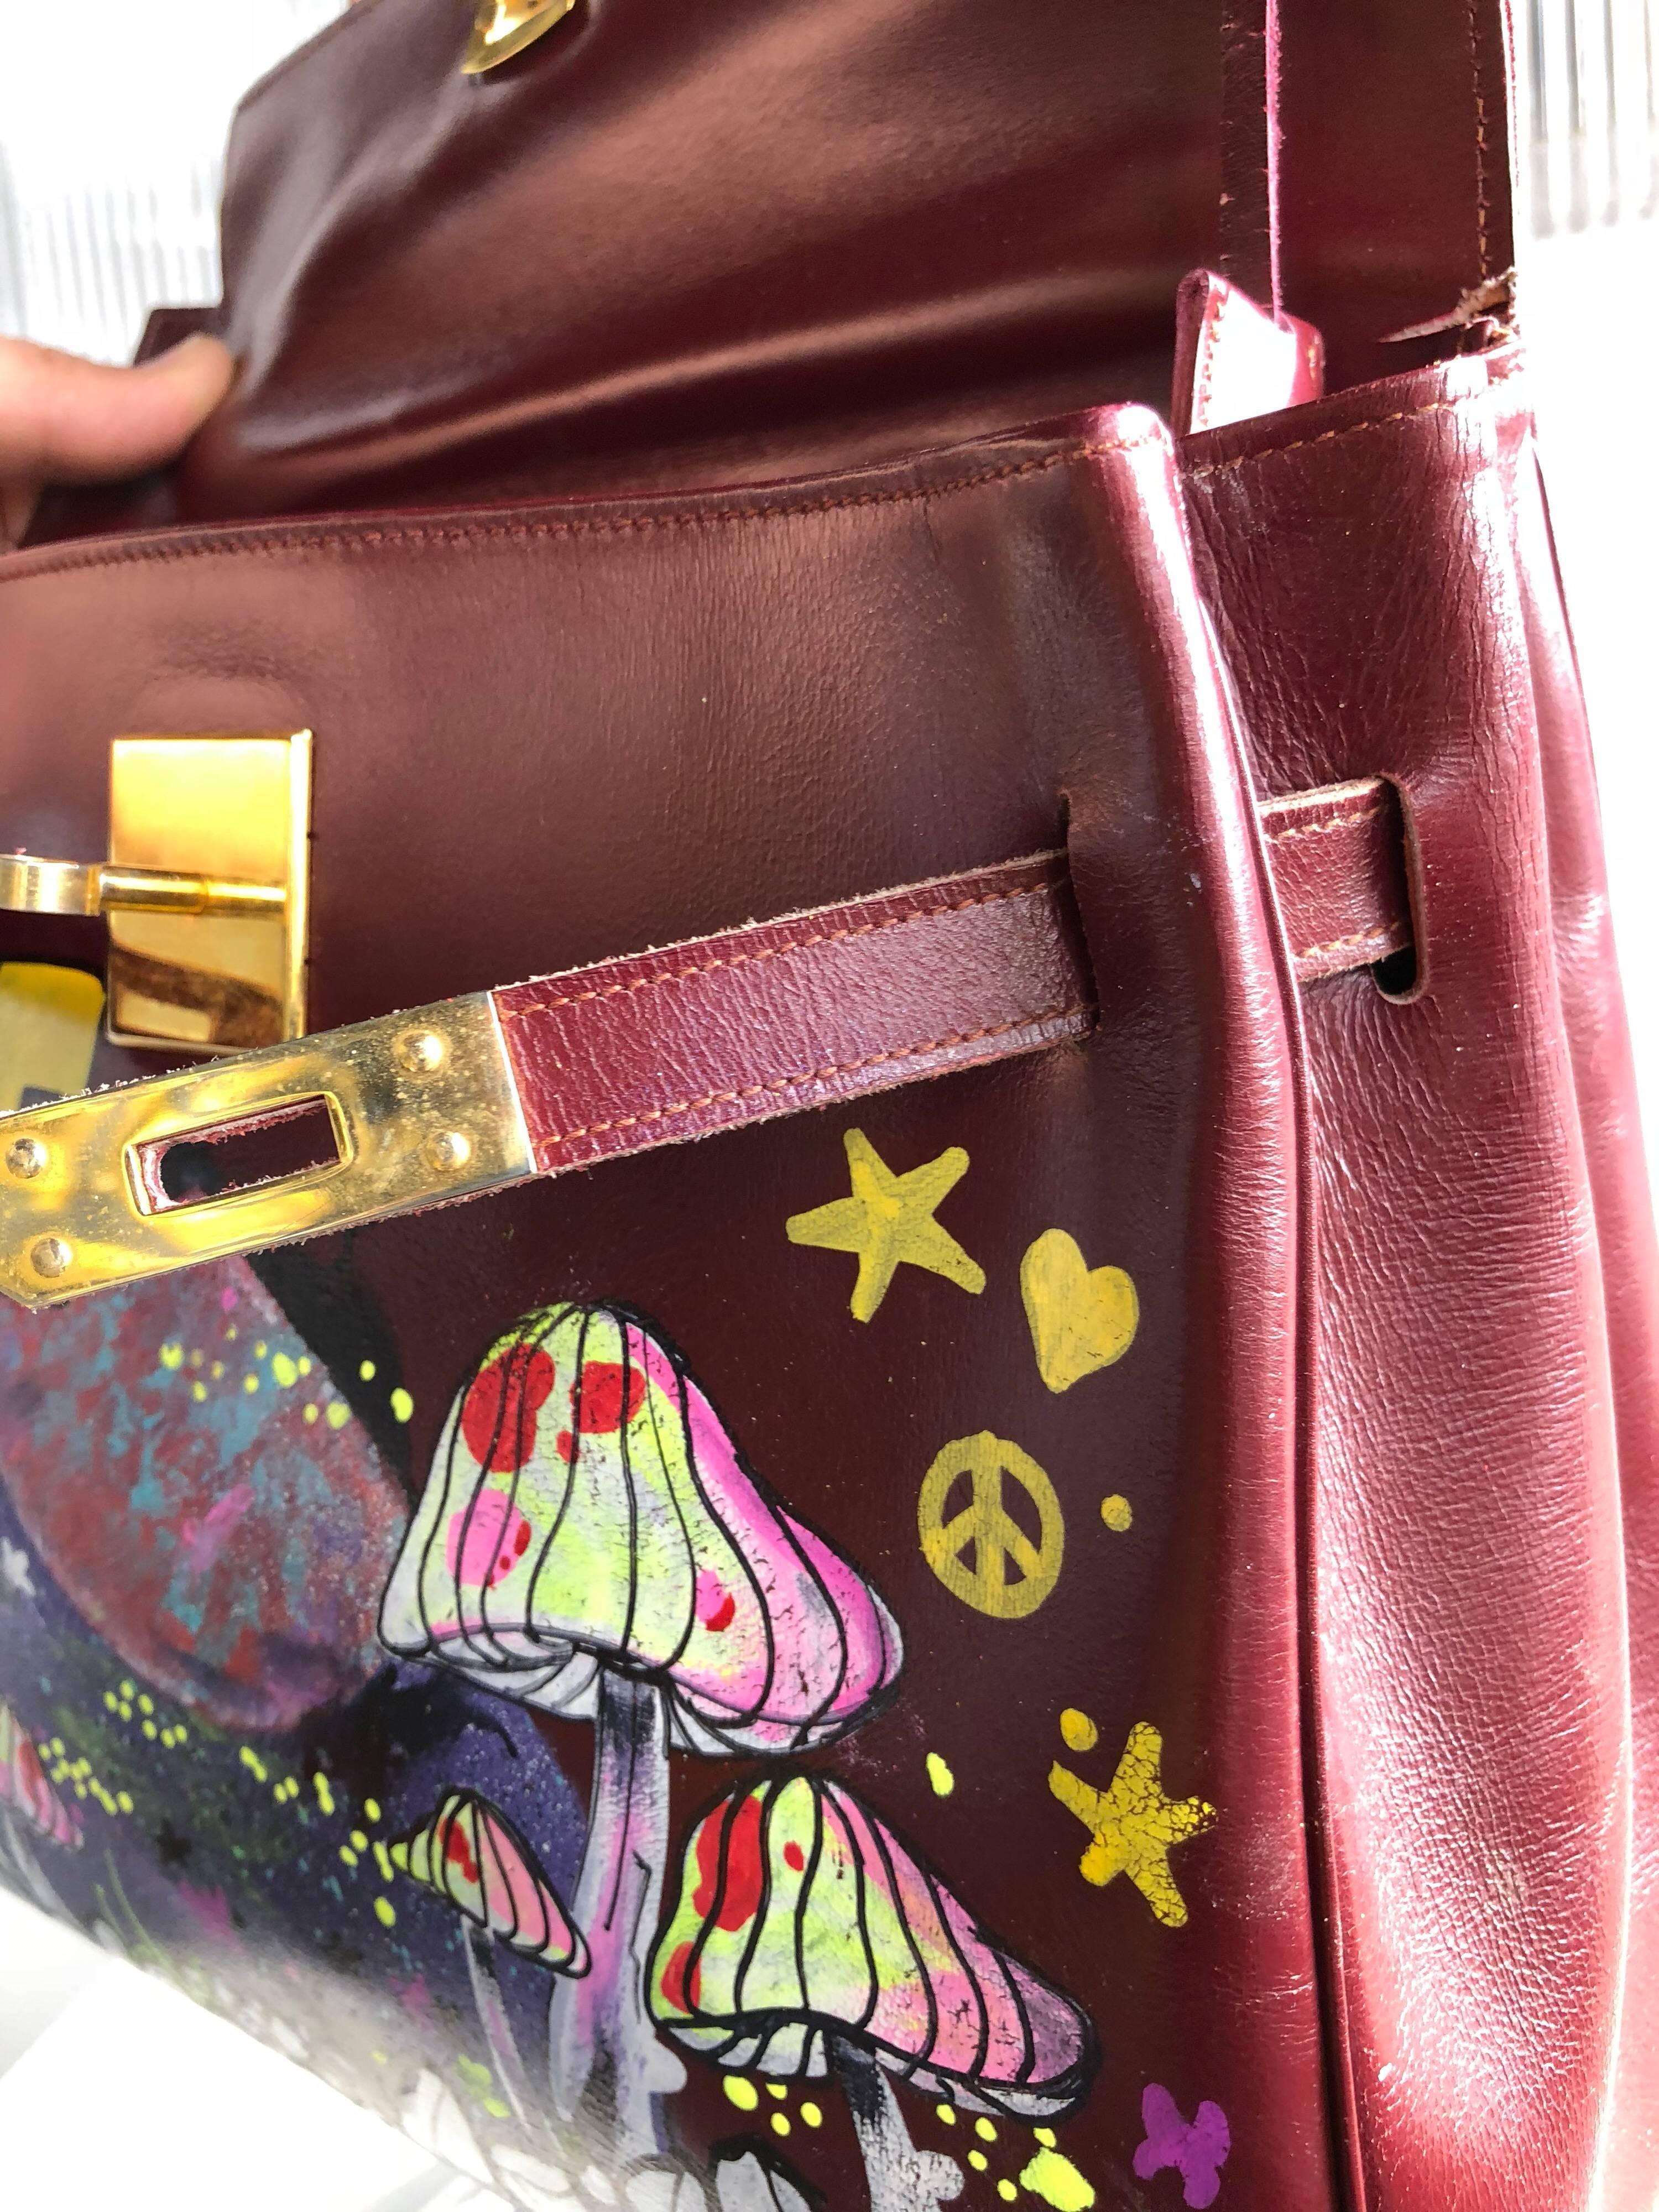 1stdibs Merlot Leather Bag With Custom Love Graffiti Art, 1950s